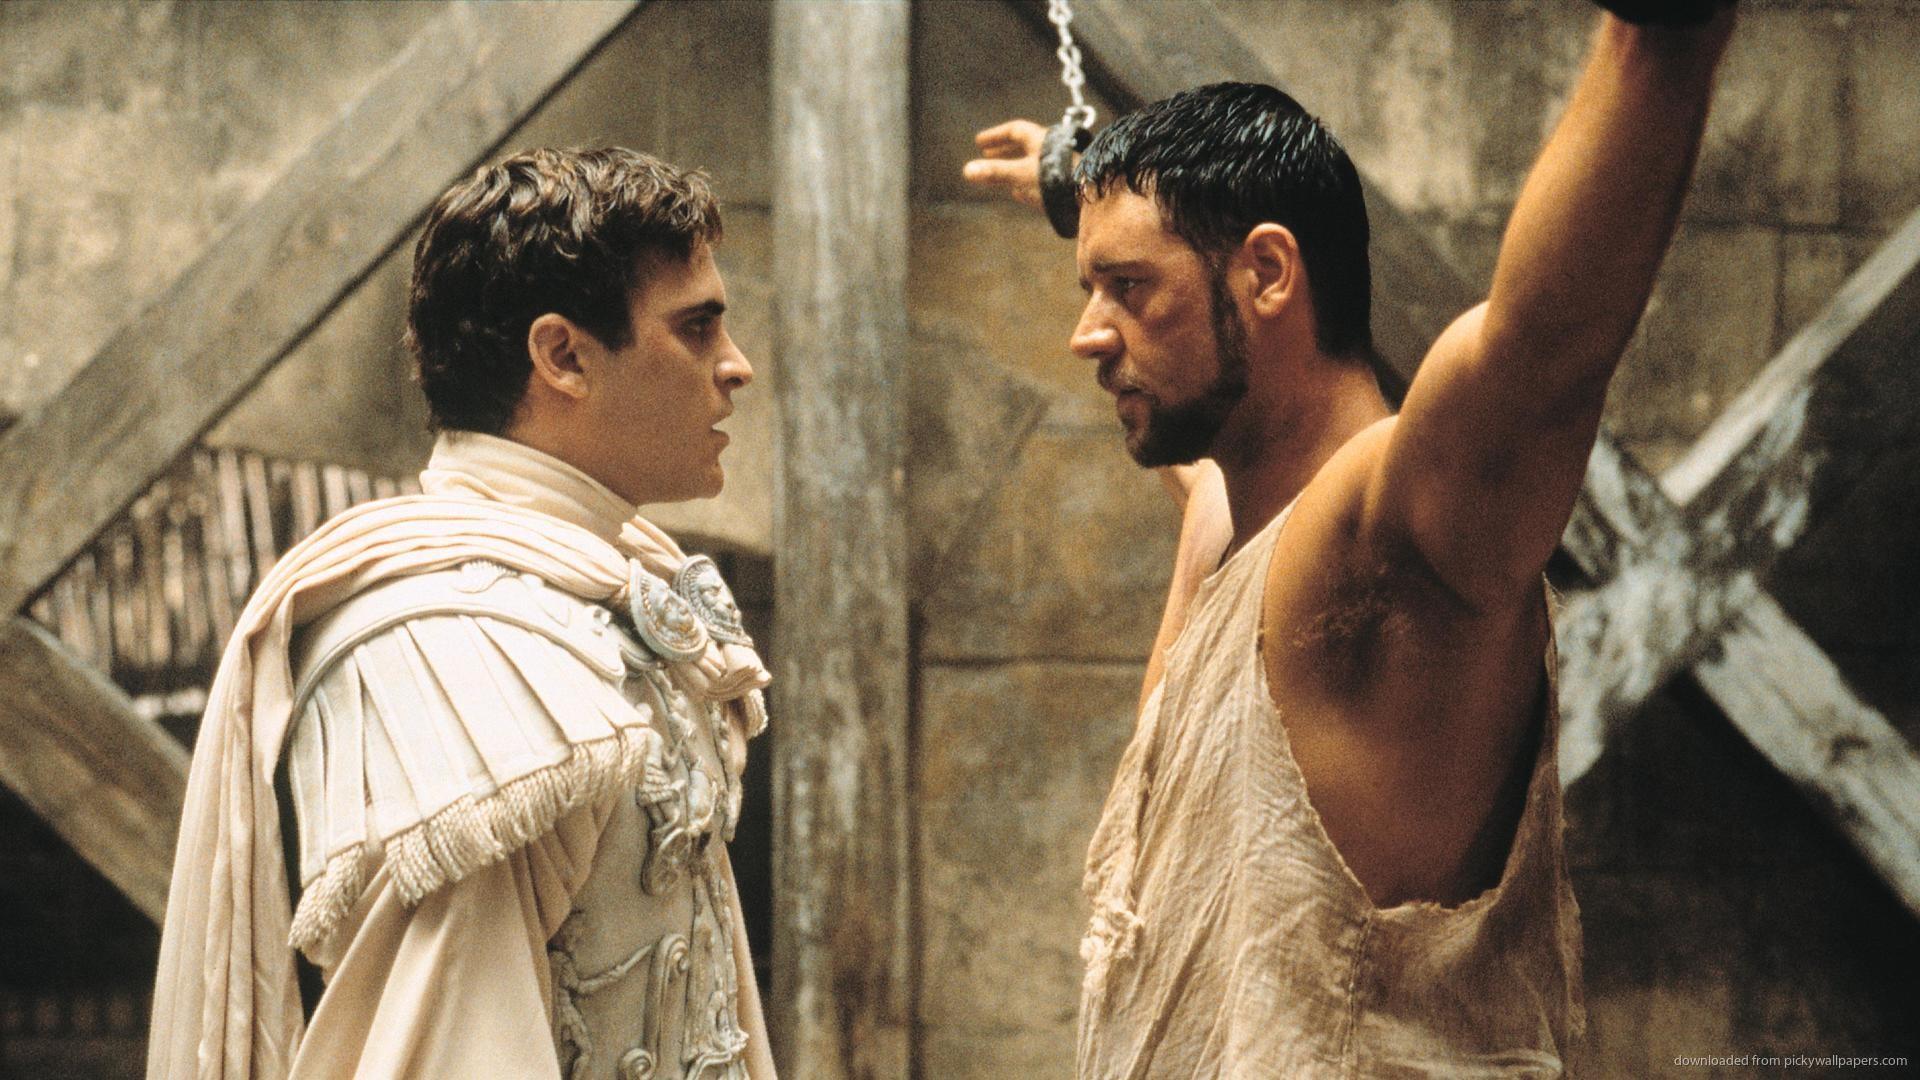 Gladiator Movie Wallpaper Background picture